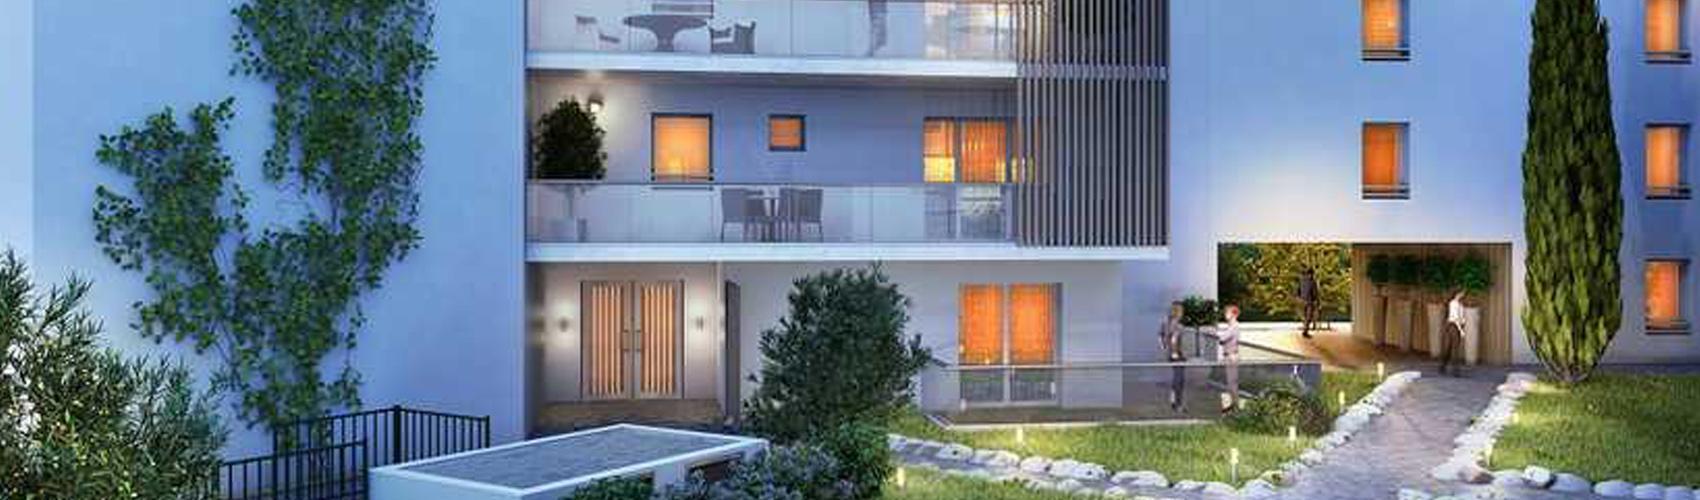 Photo du programme immobilier neuf NIM-2121 à Nîmes